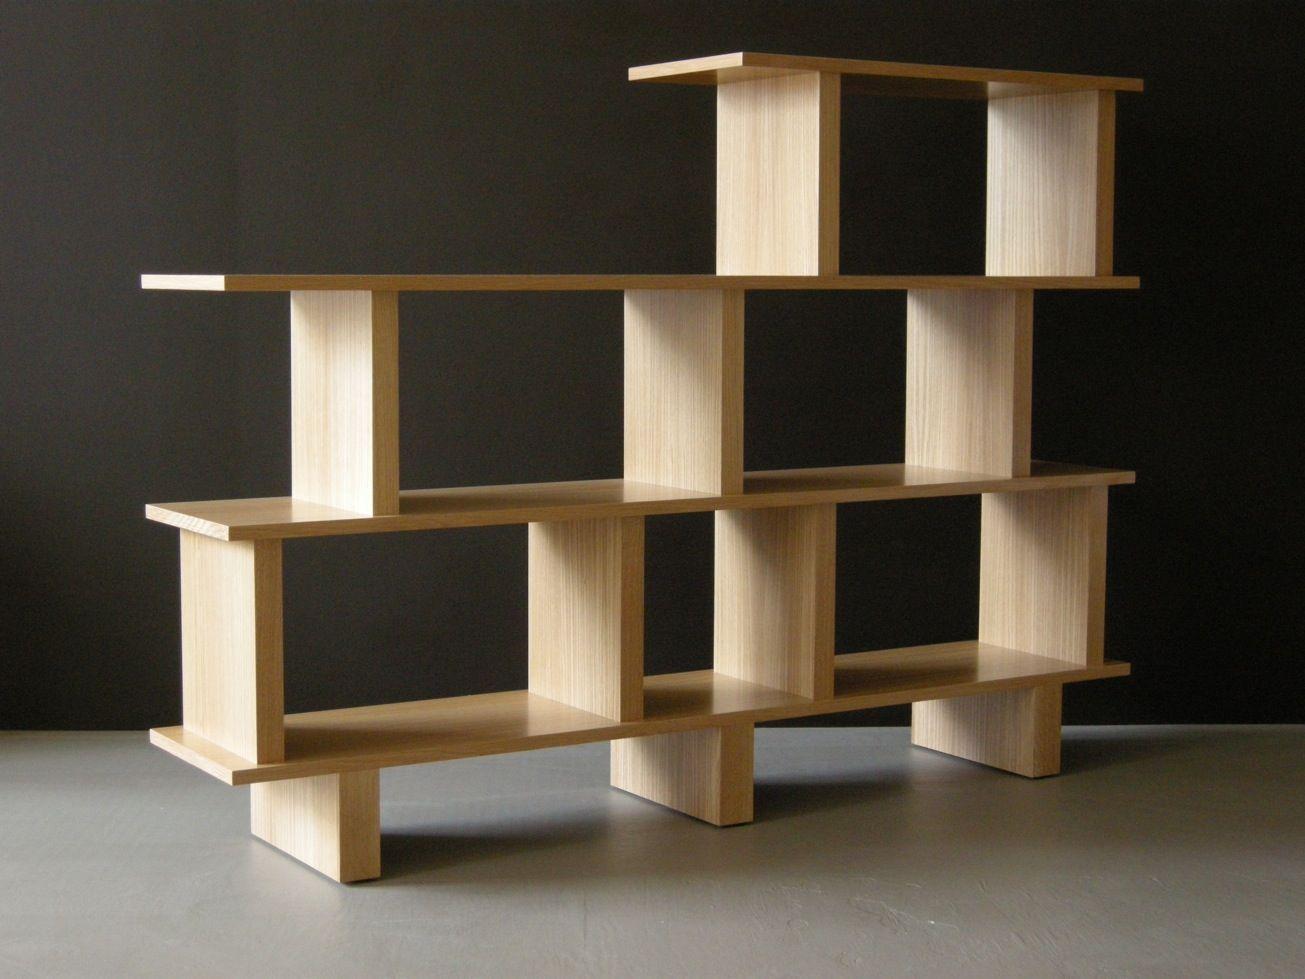 Shelving And Display   San Francisco Bay Area Modern Furniture   Jason Lees  Design